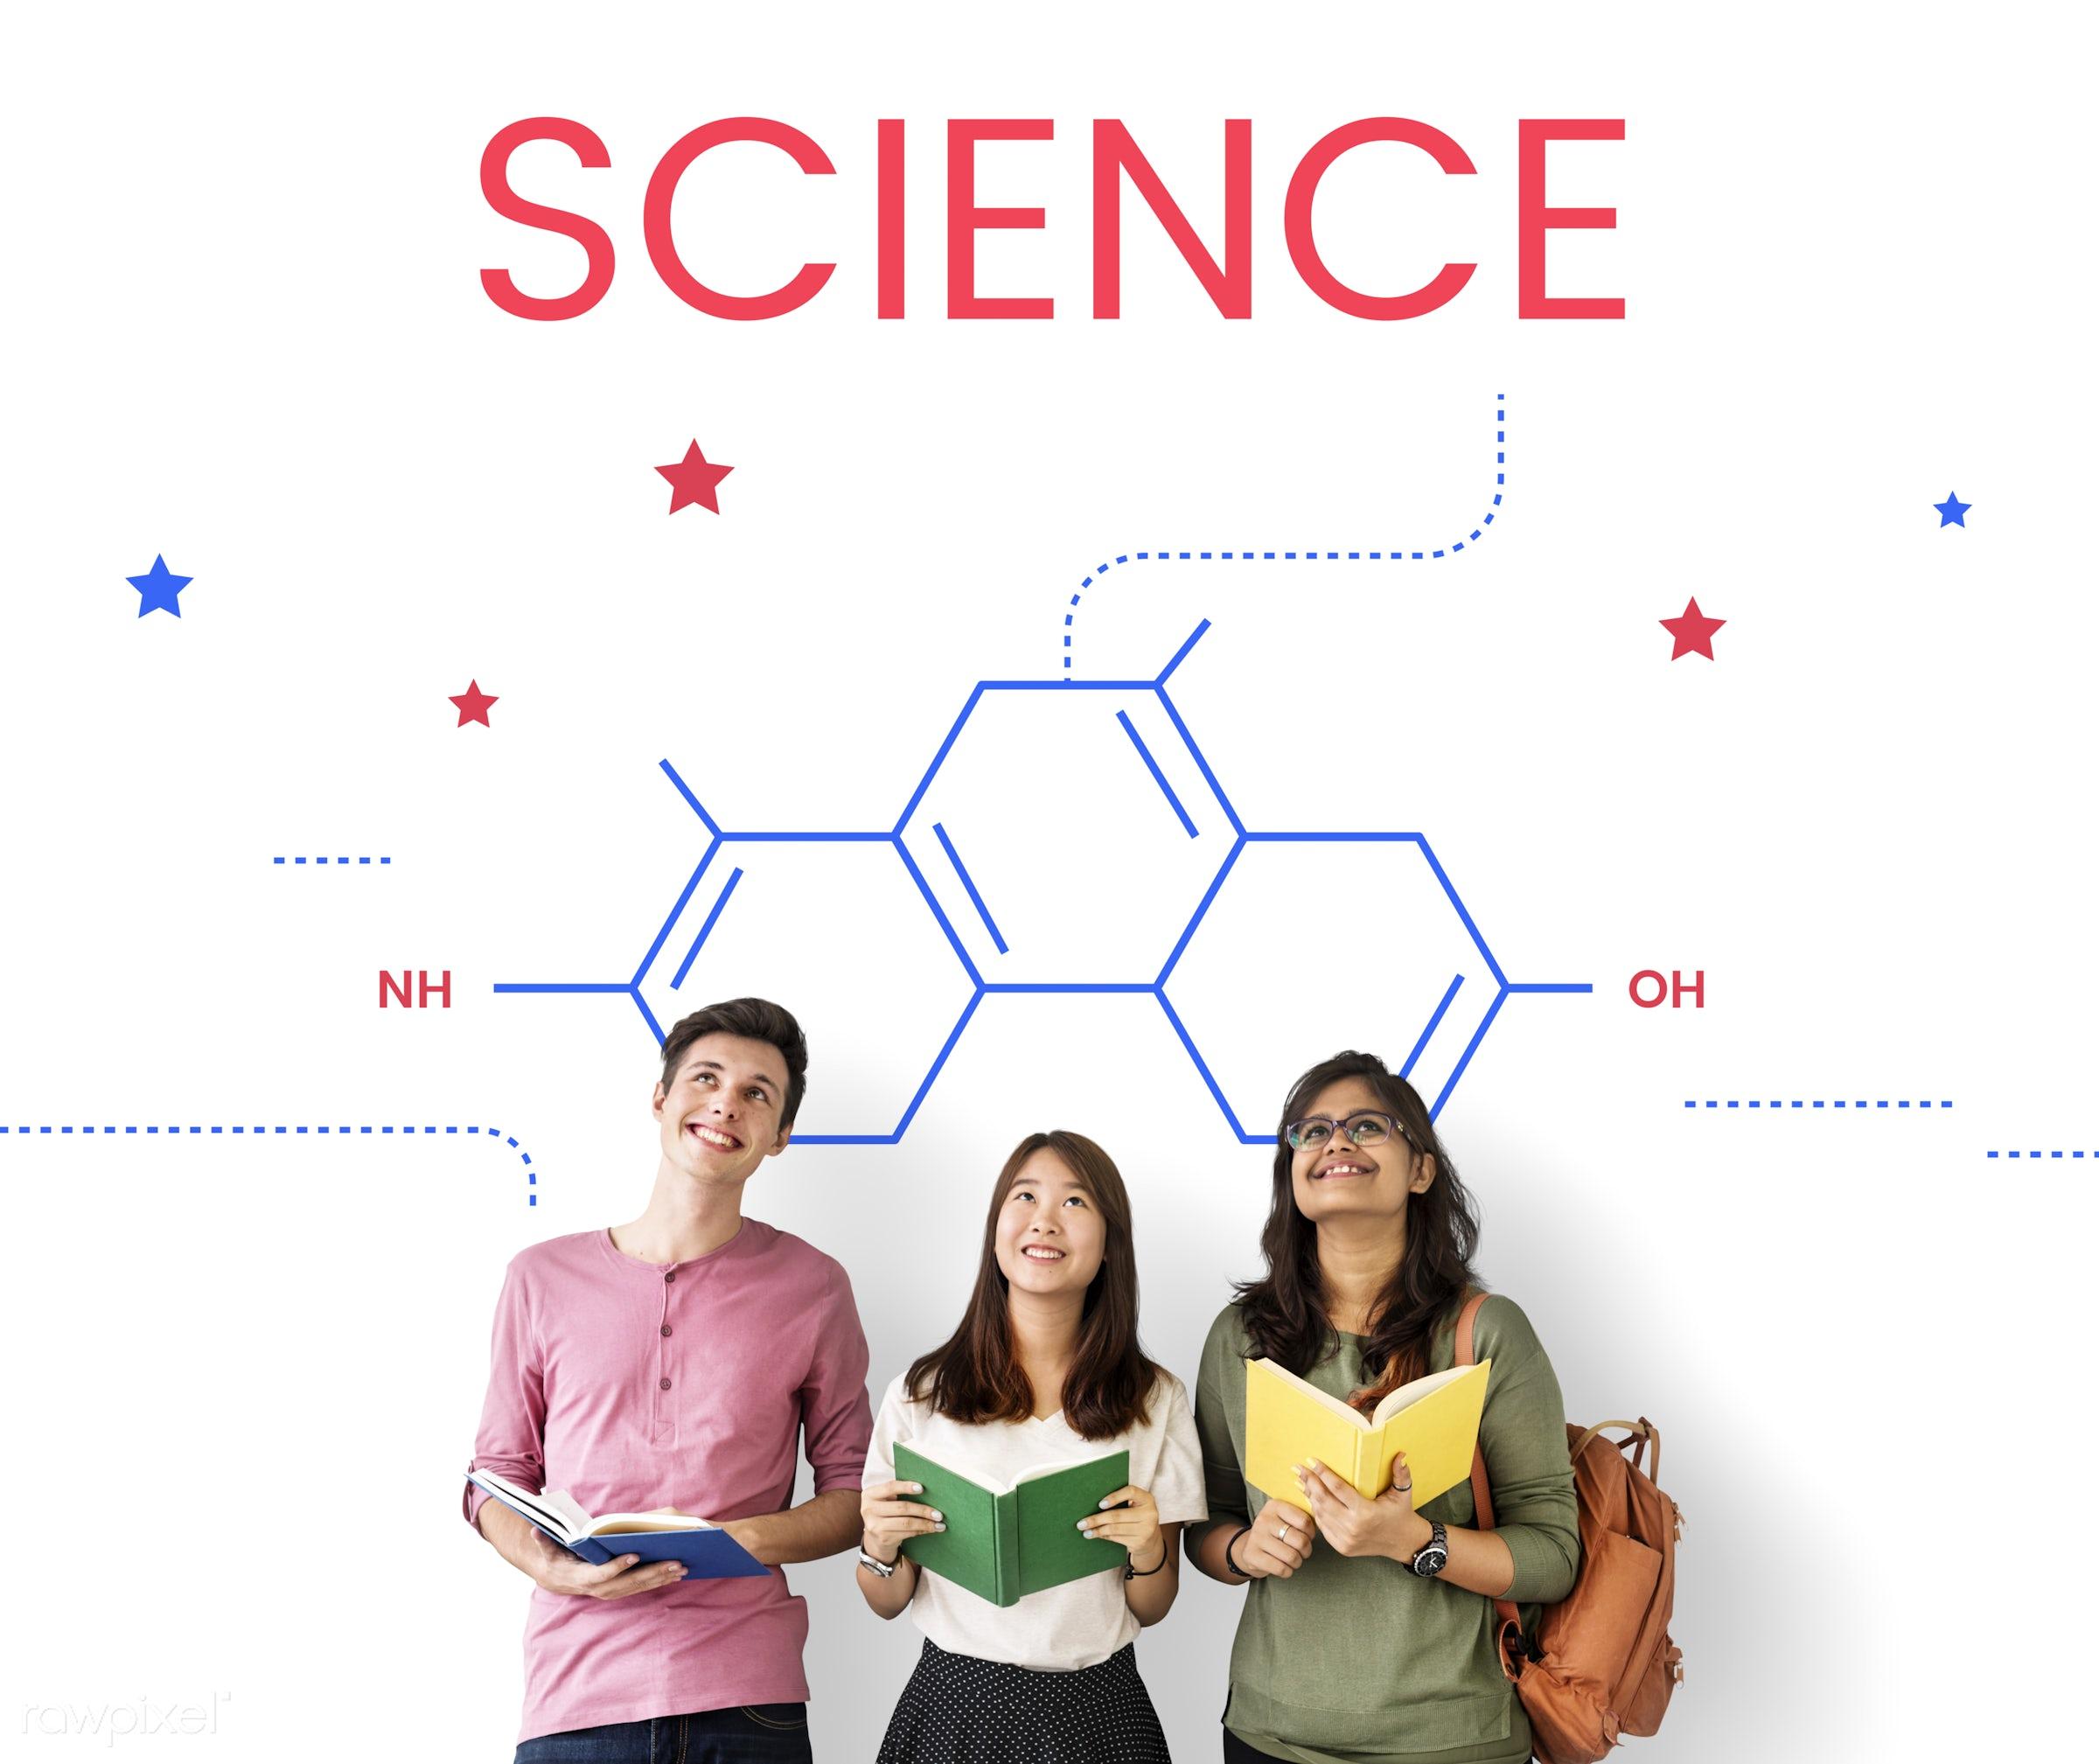 african descent, asian, biology, book, caucasian, chemistry, discipline, diversity, education, enjoyment, experiment,...